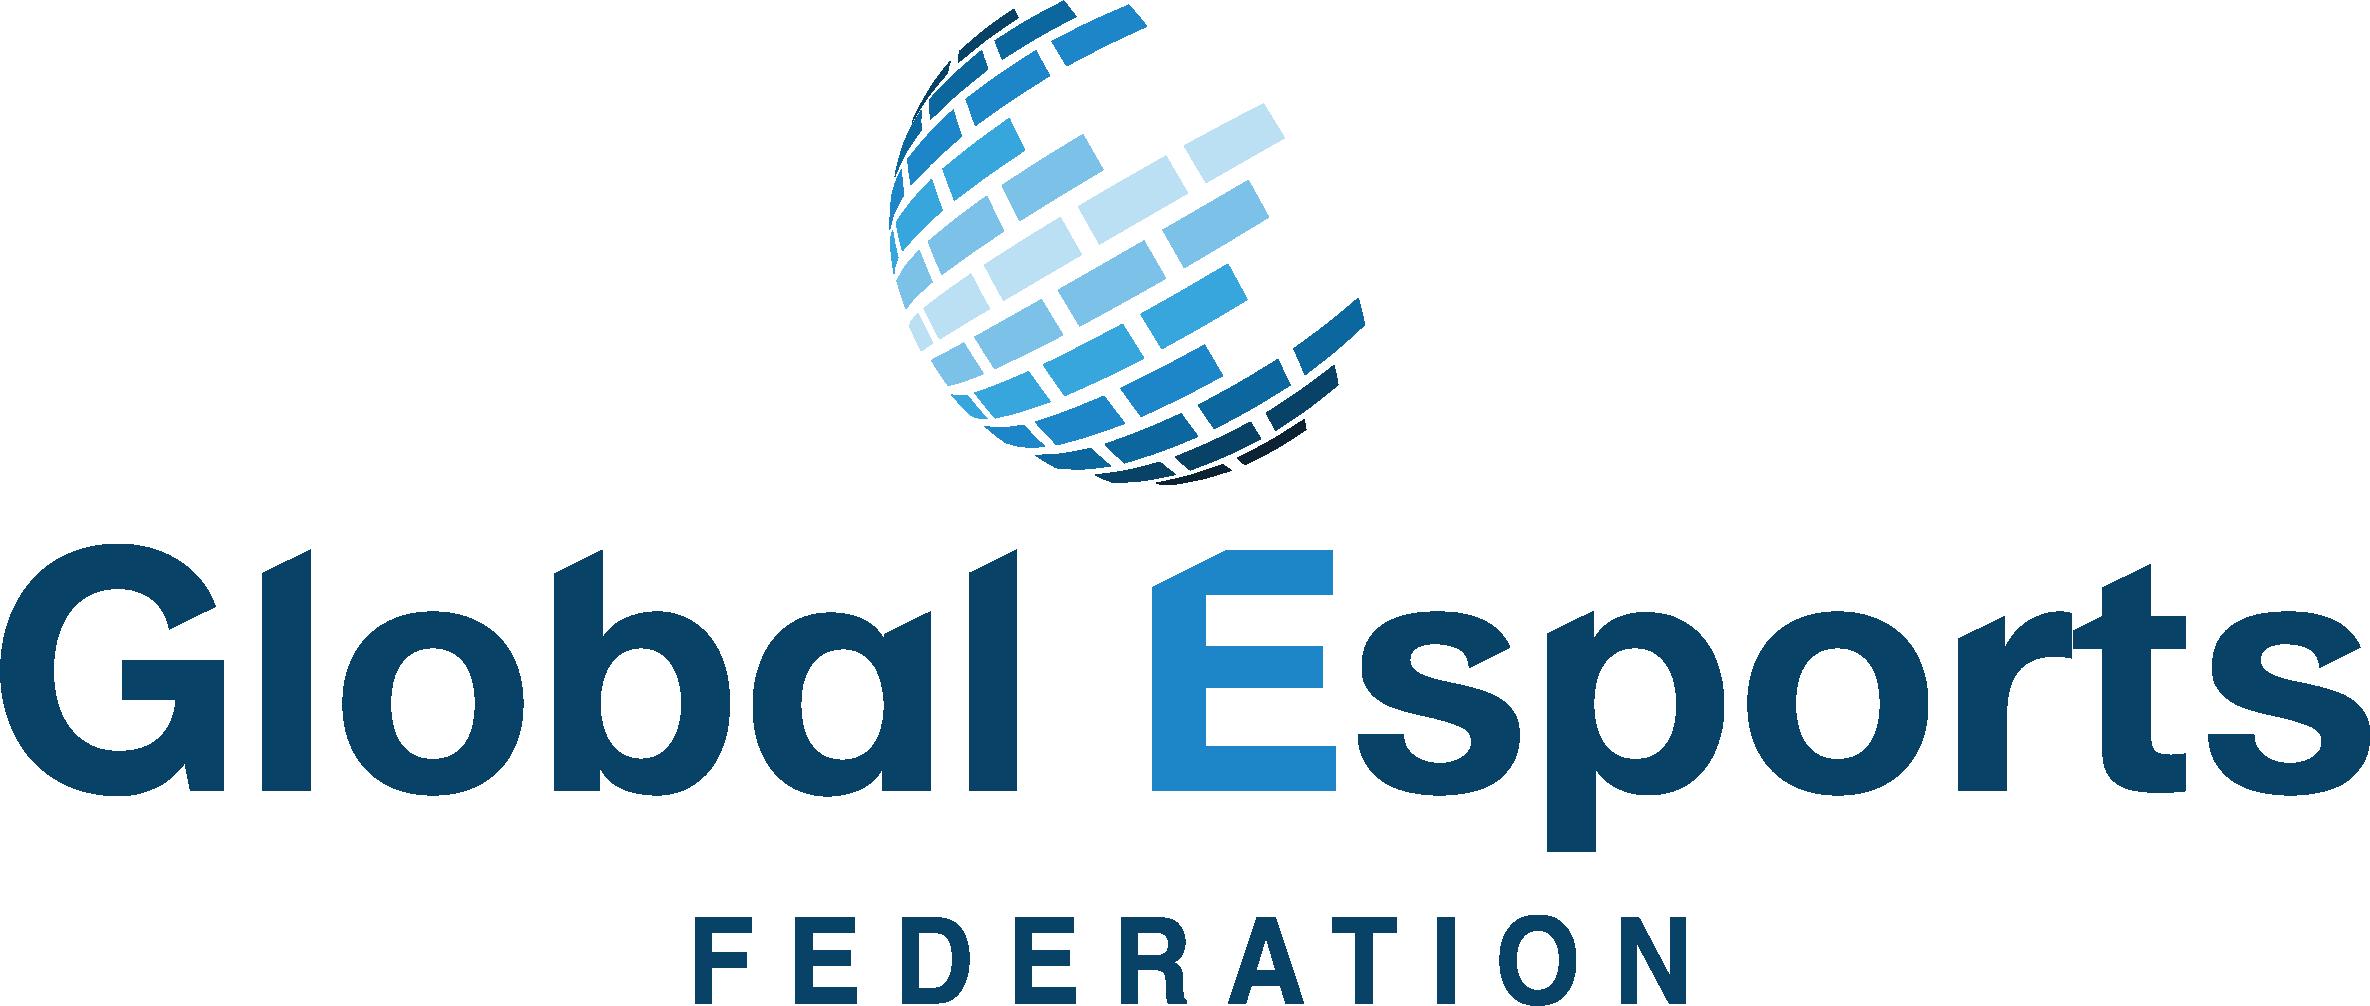 Global Esports Federation Secondary Logo